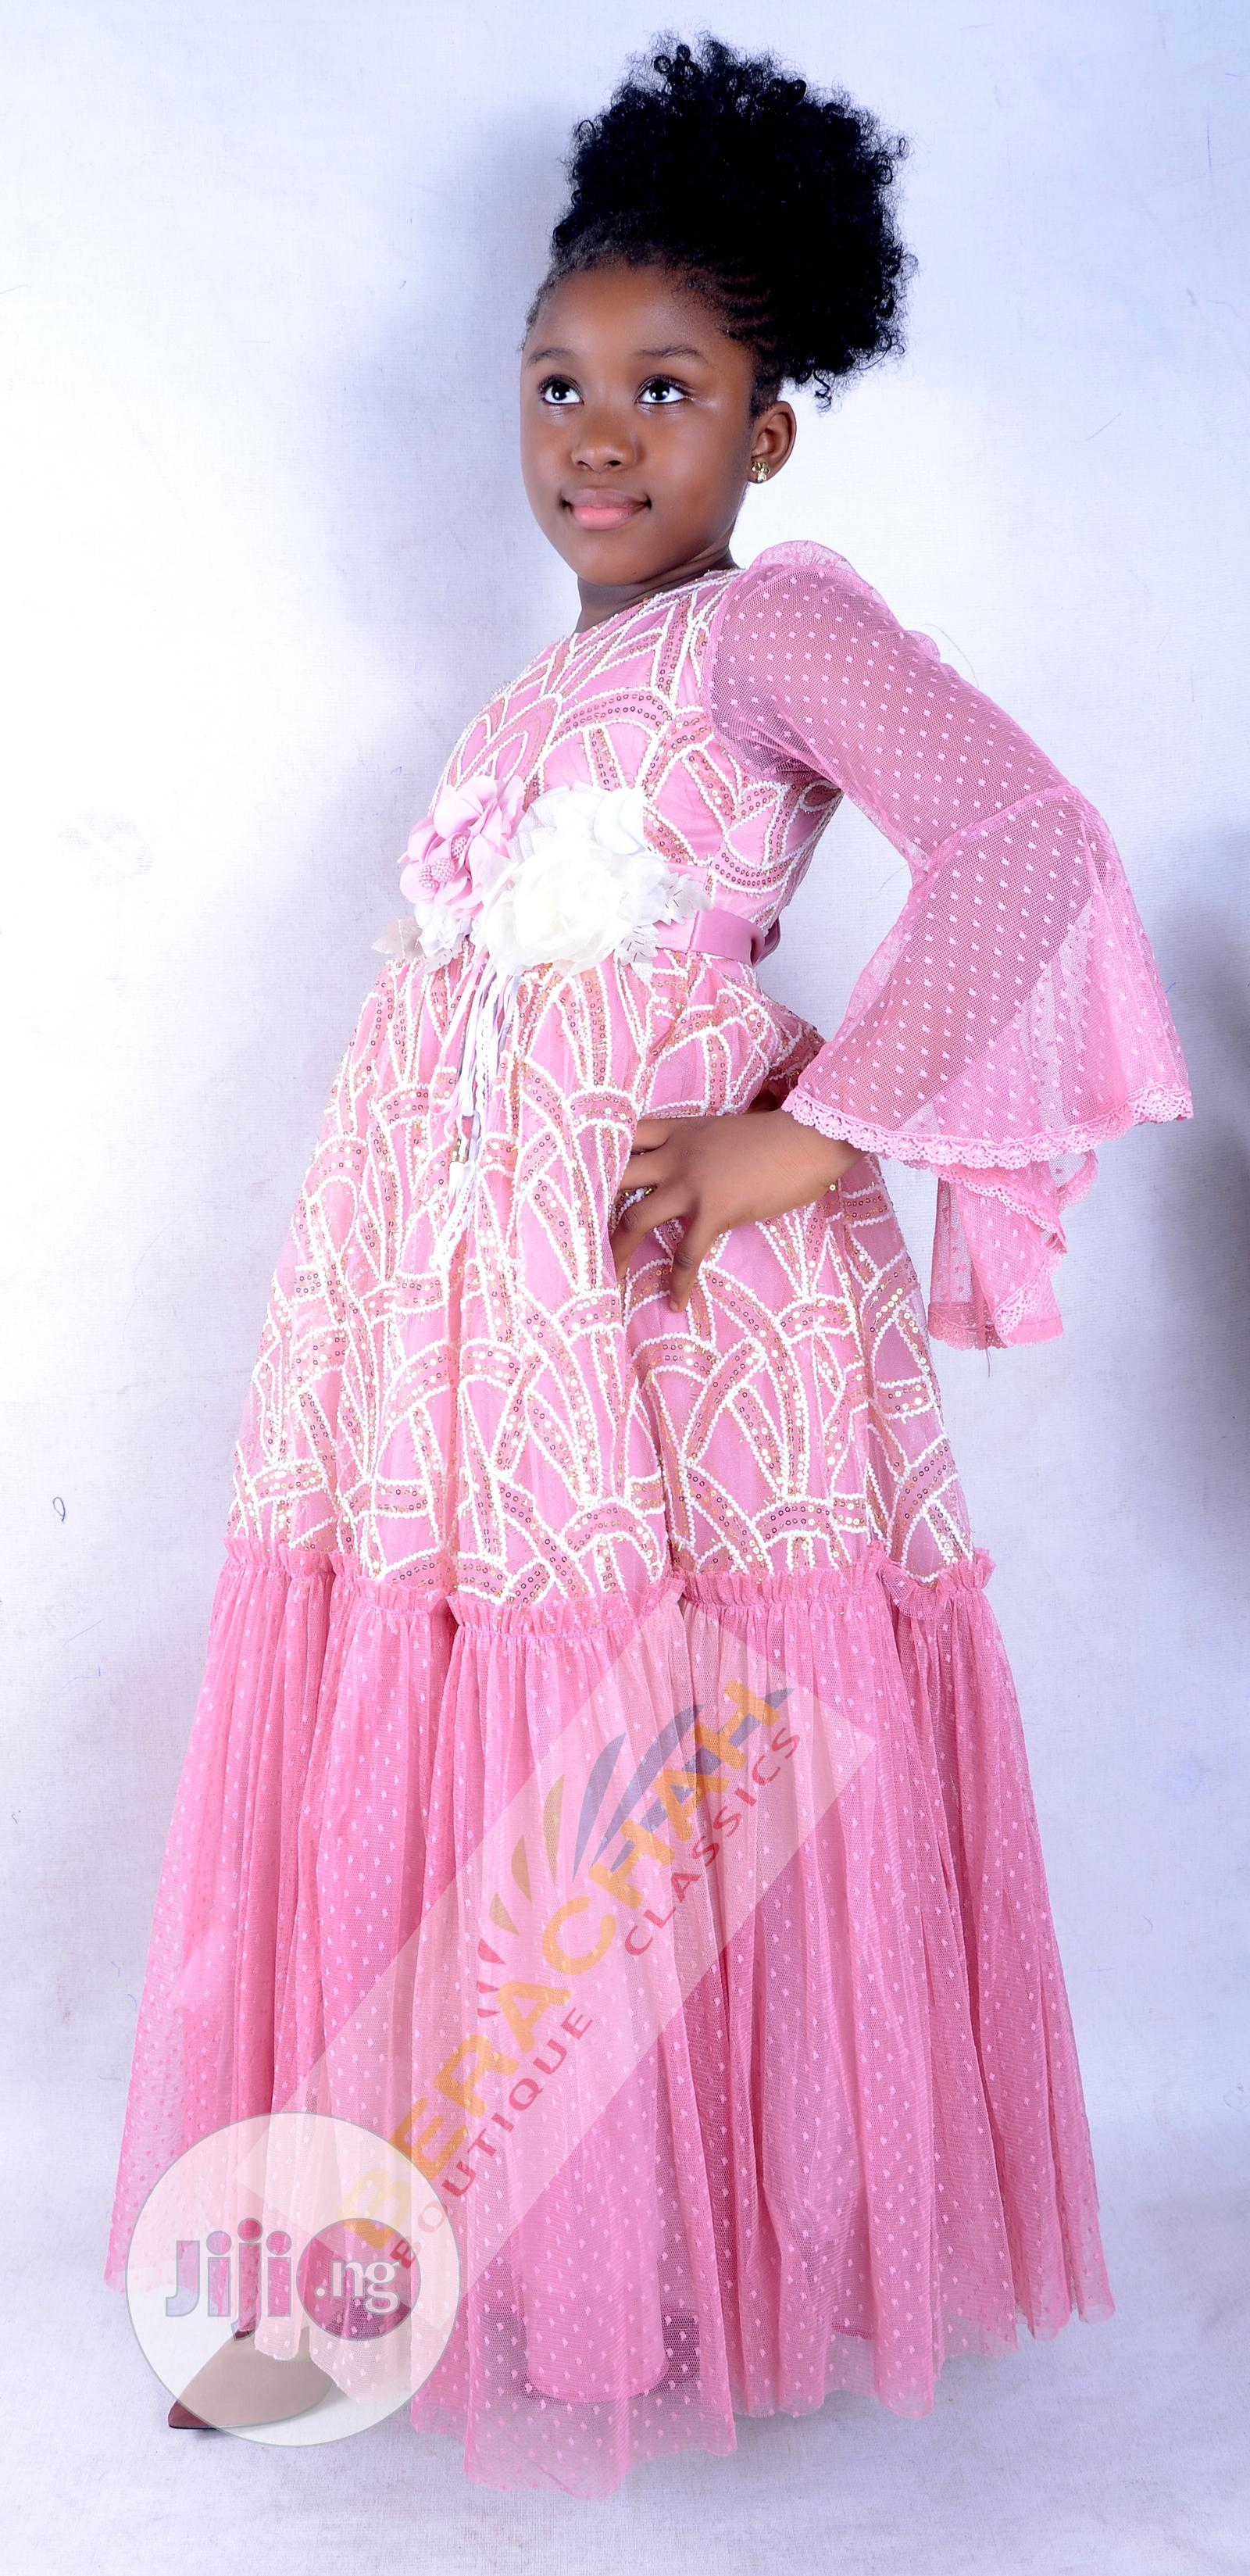 Made in Turkey Girls Ball Dress